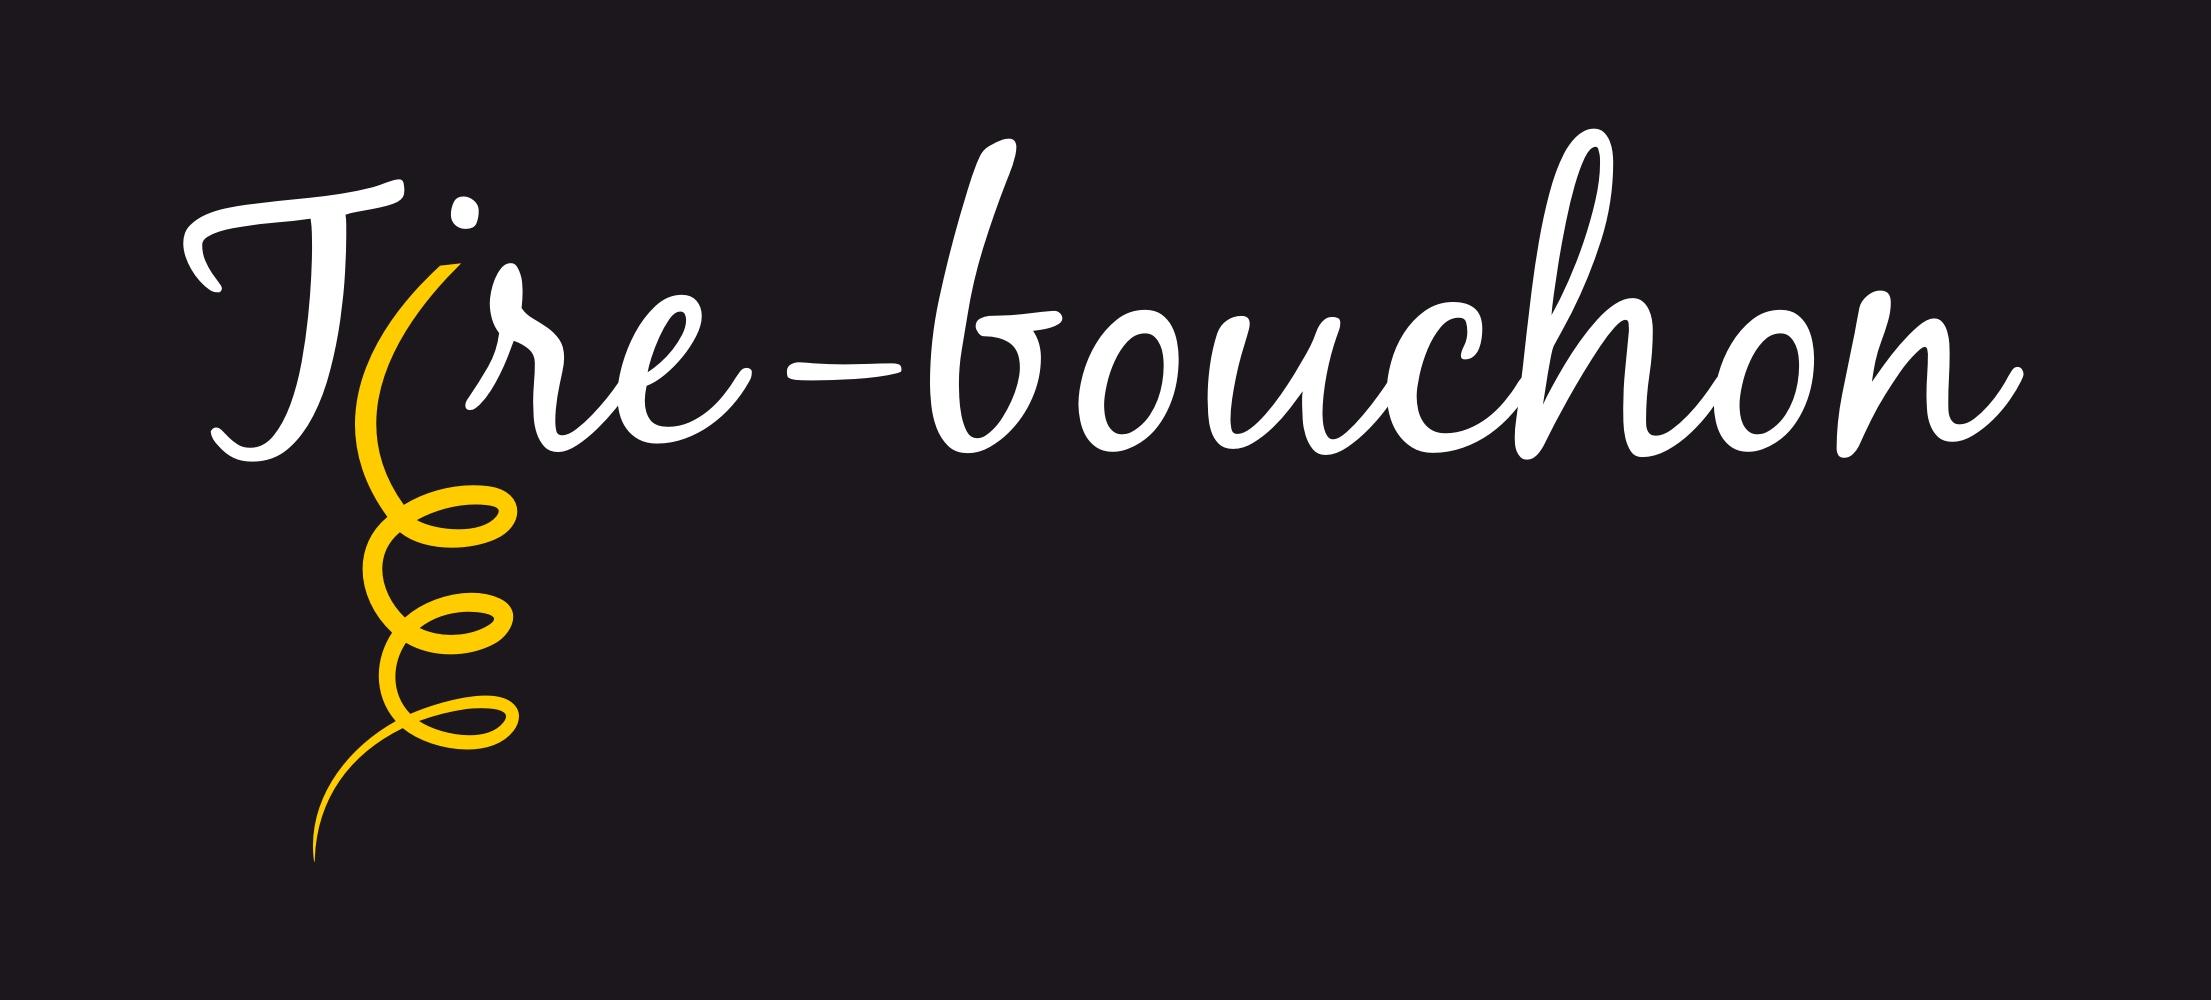 Tire-Bouchon